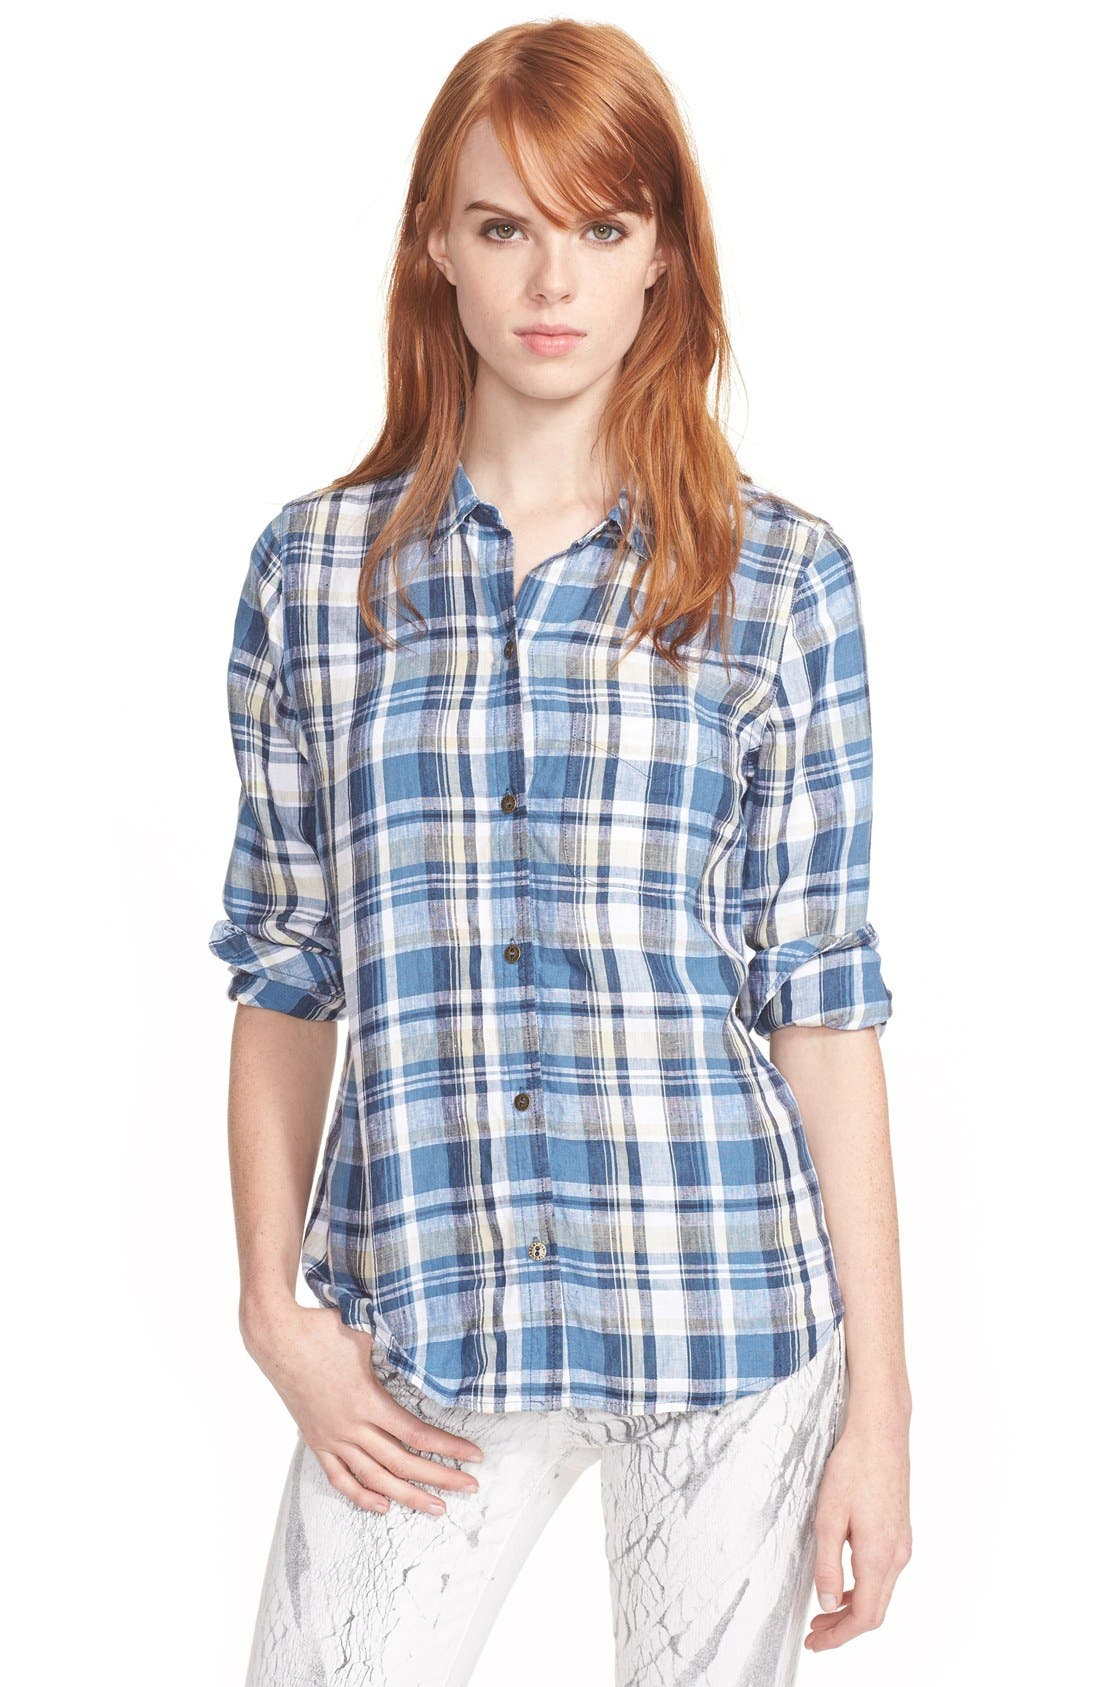 Alternate Image 1 Selected - Current/Elliott 'The Slim Boy' Plaid Linen Shirt